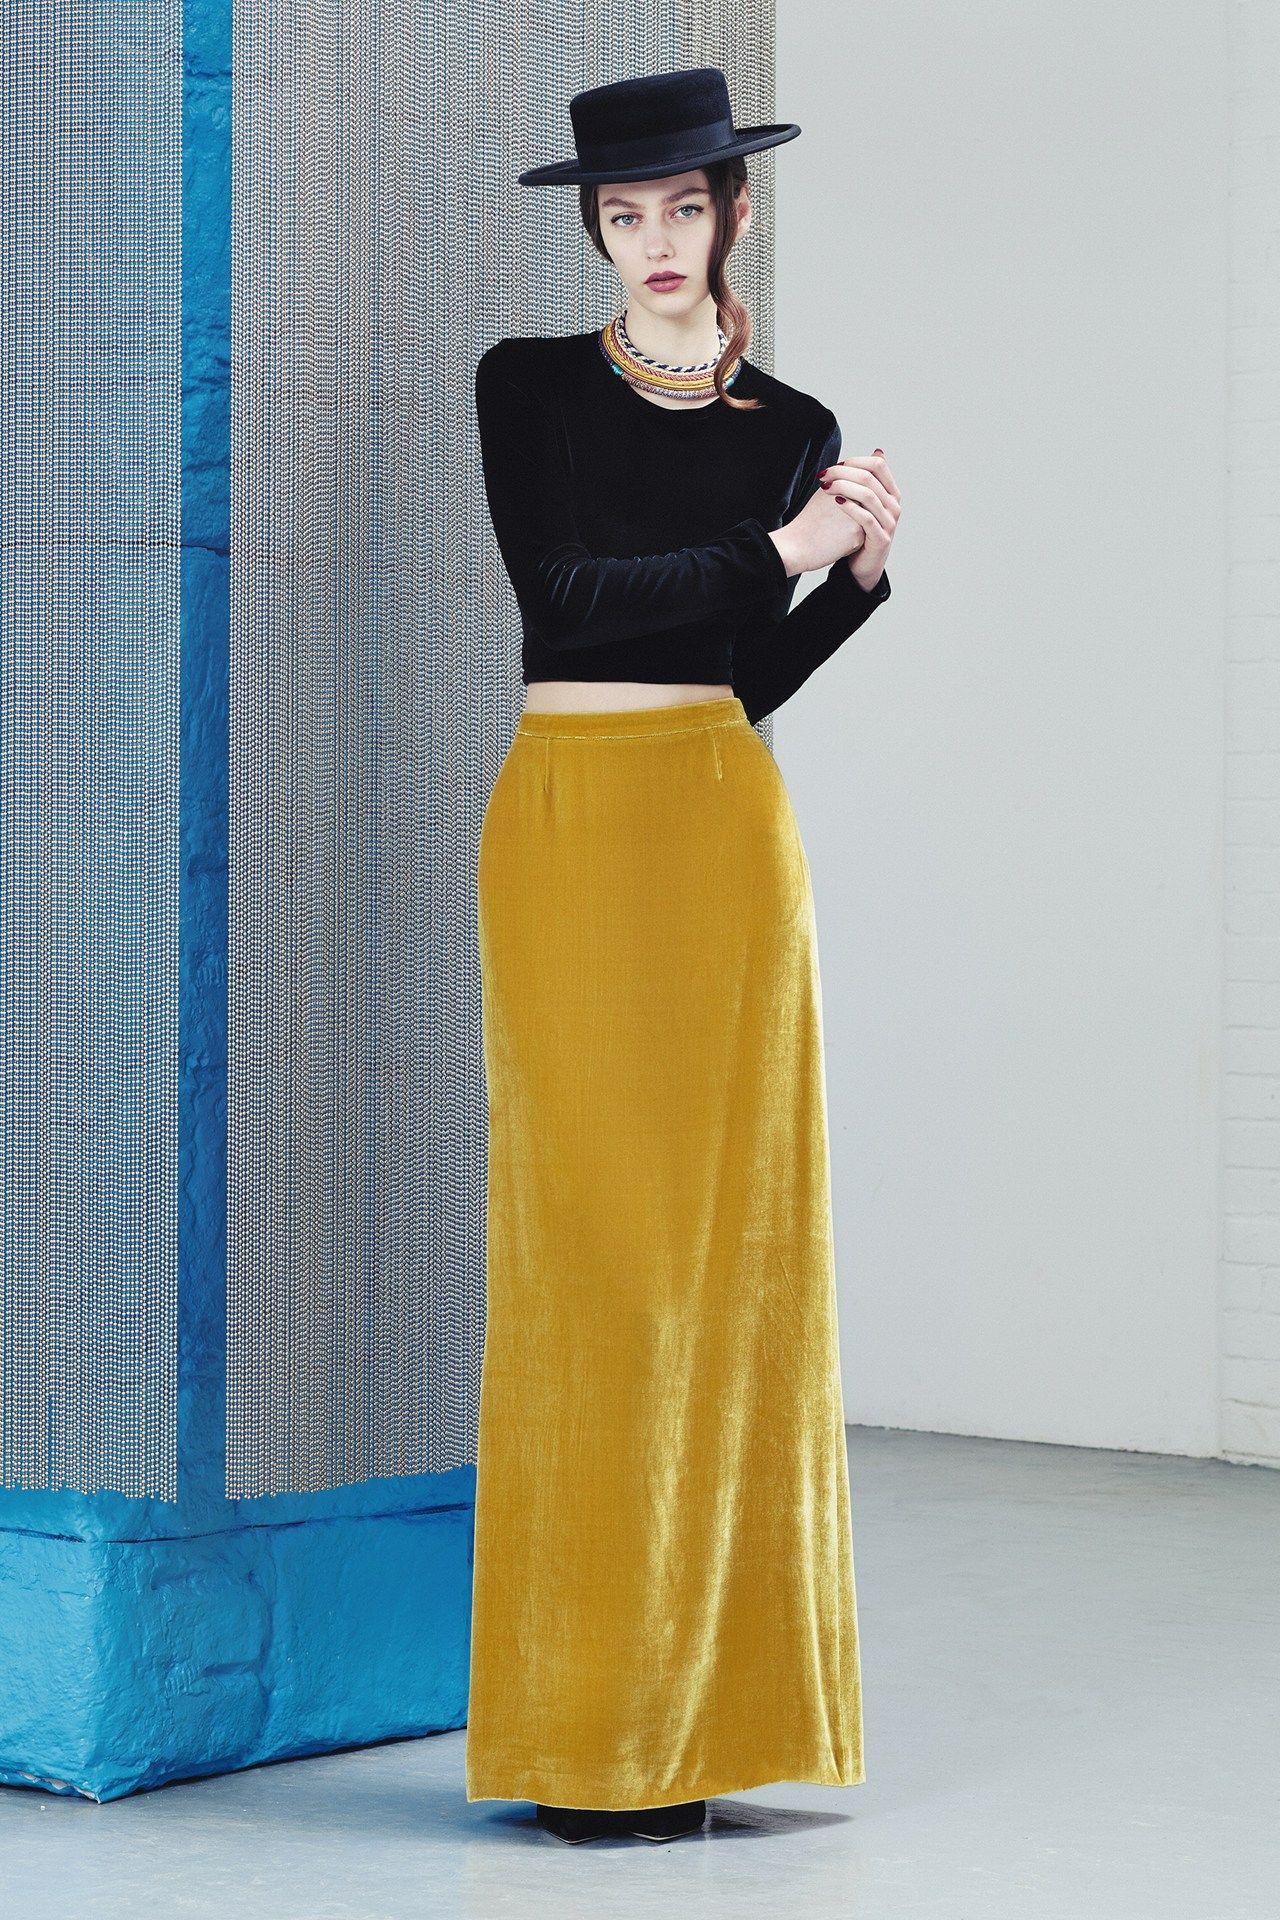 Alexander Lewis, pre-autumn/winter 2015 fashion collection